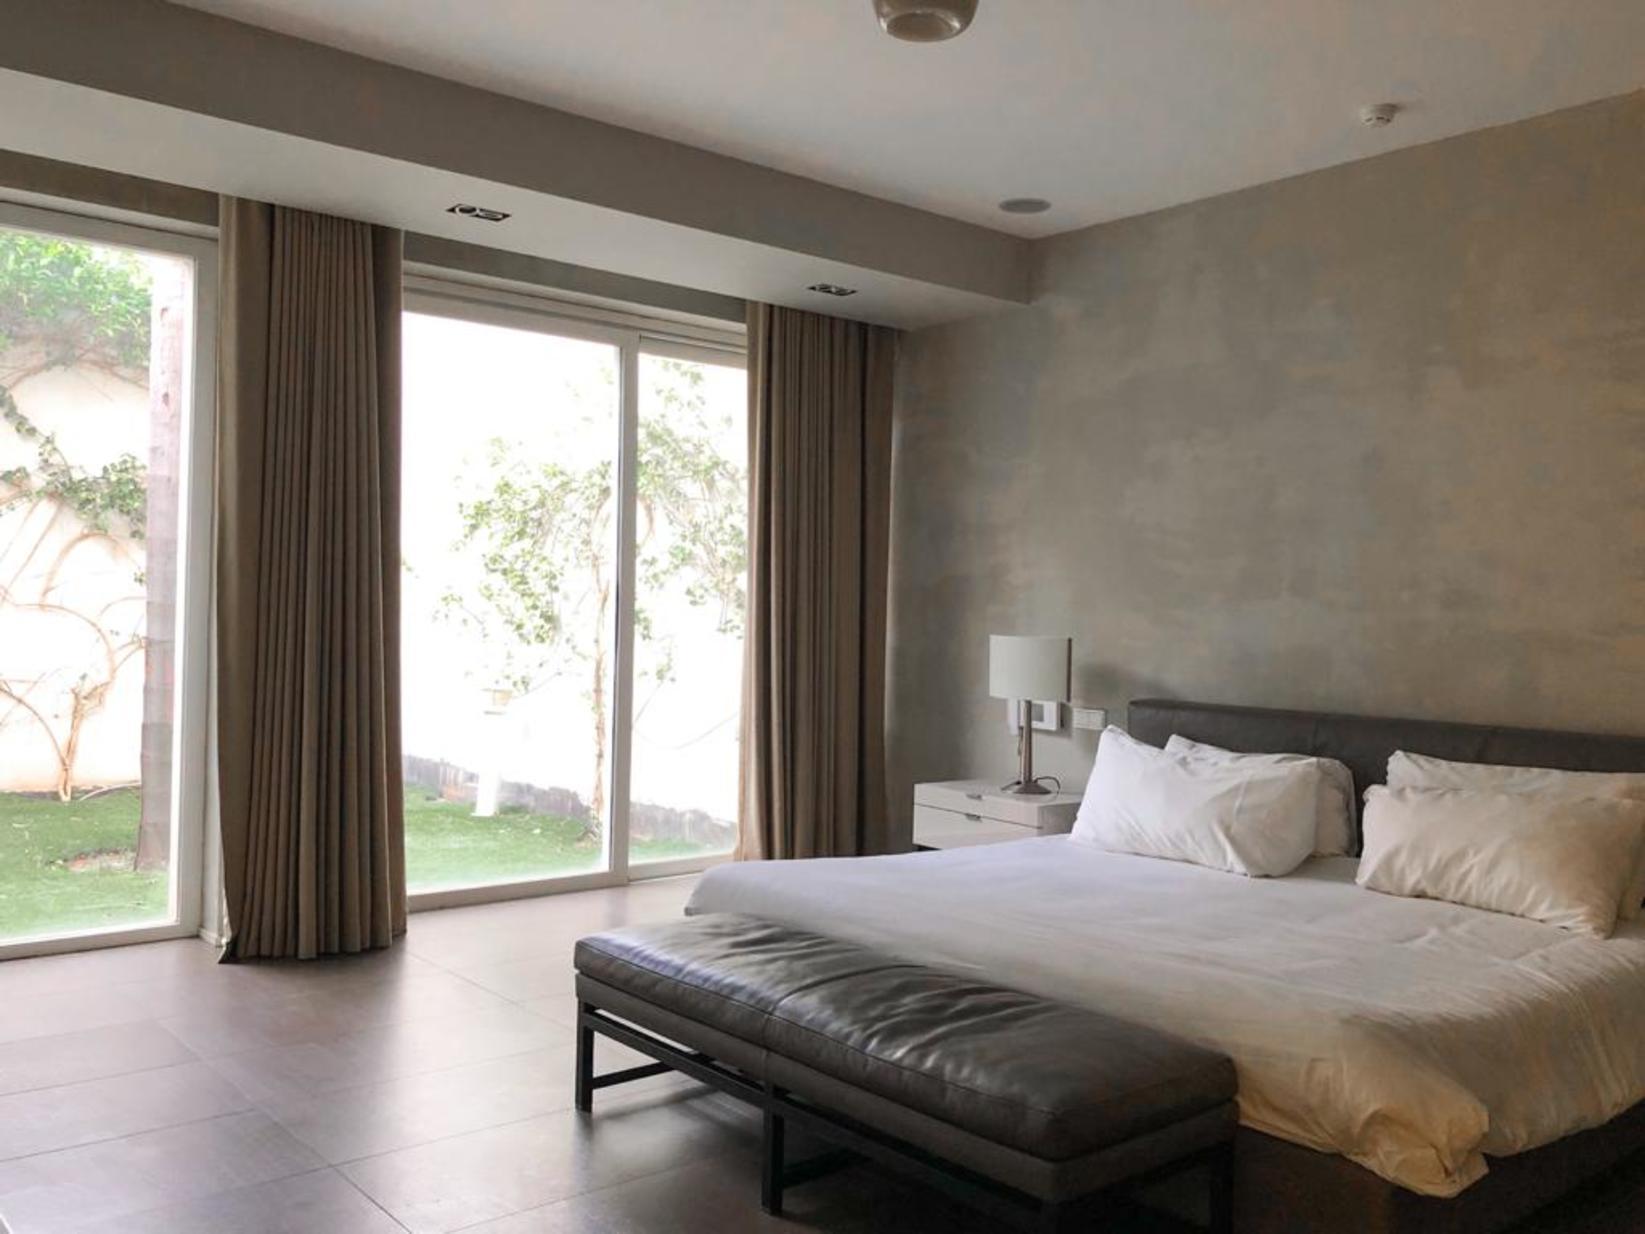 3 bed Villa For Rent in Bahar ic-Caghaq, Bahar ic-Caghaq - thumb 15